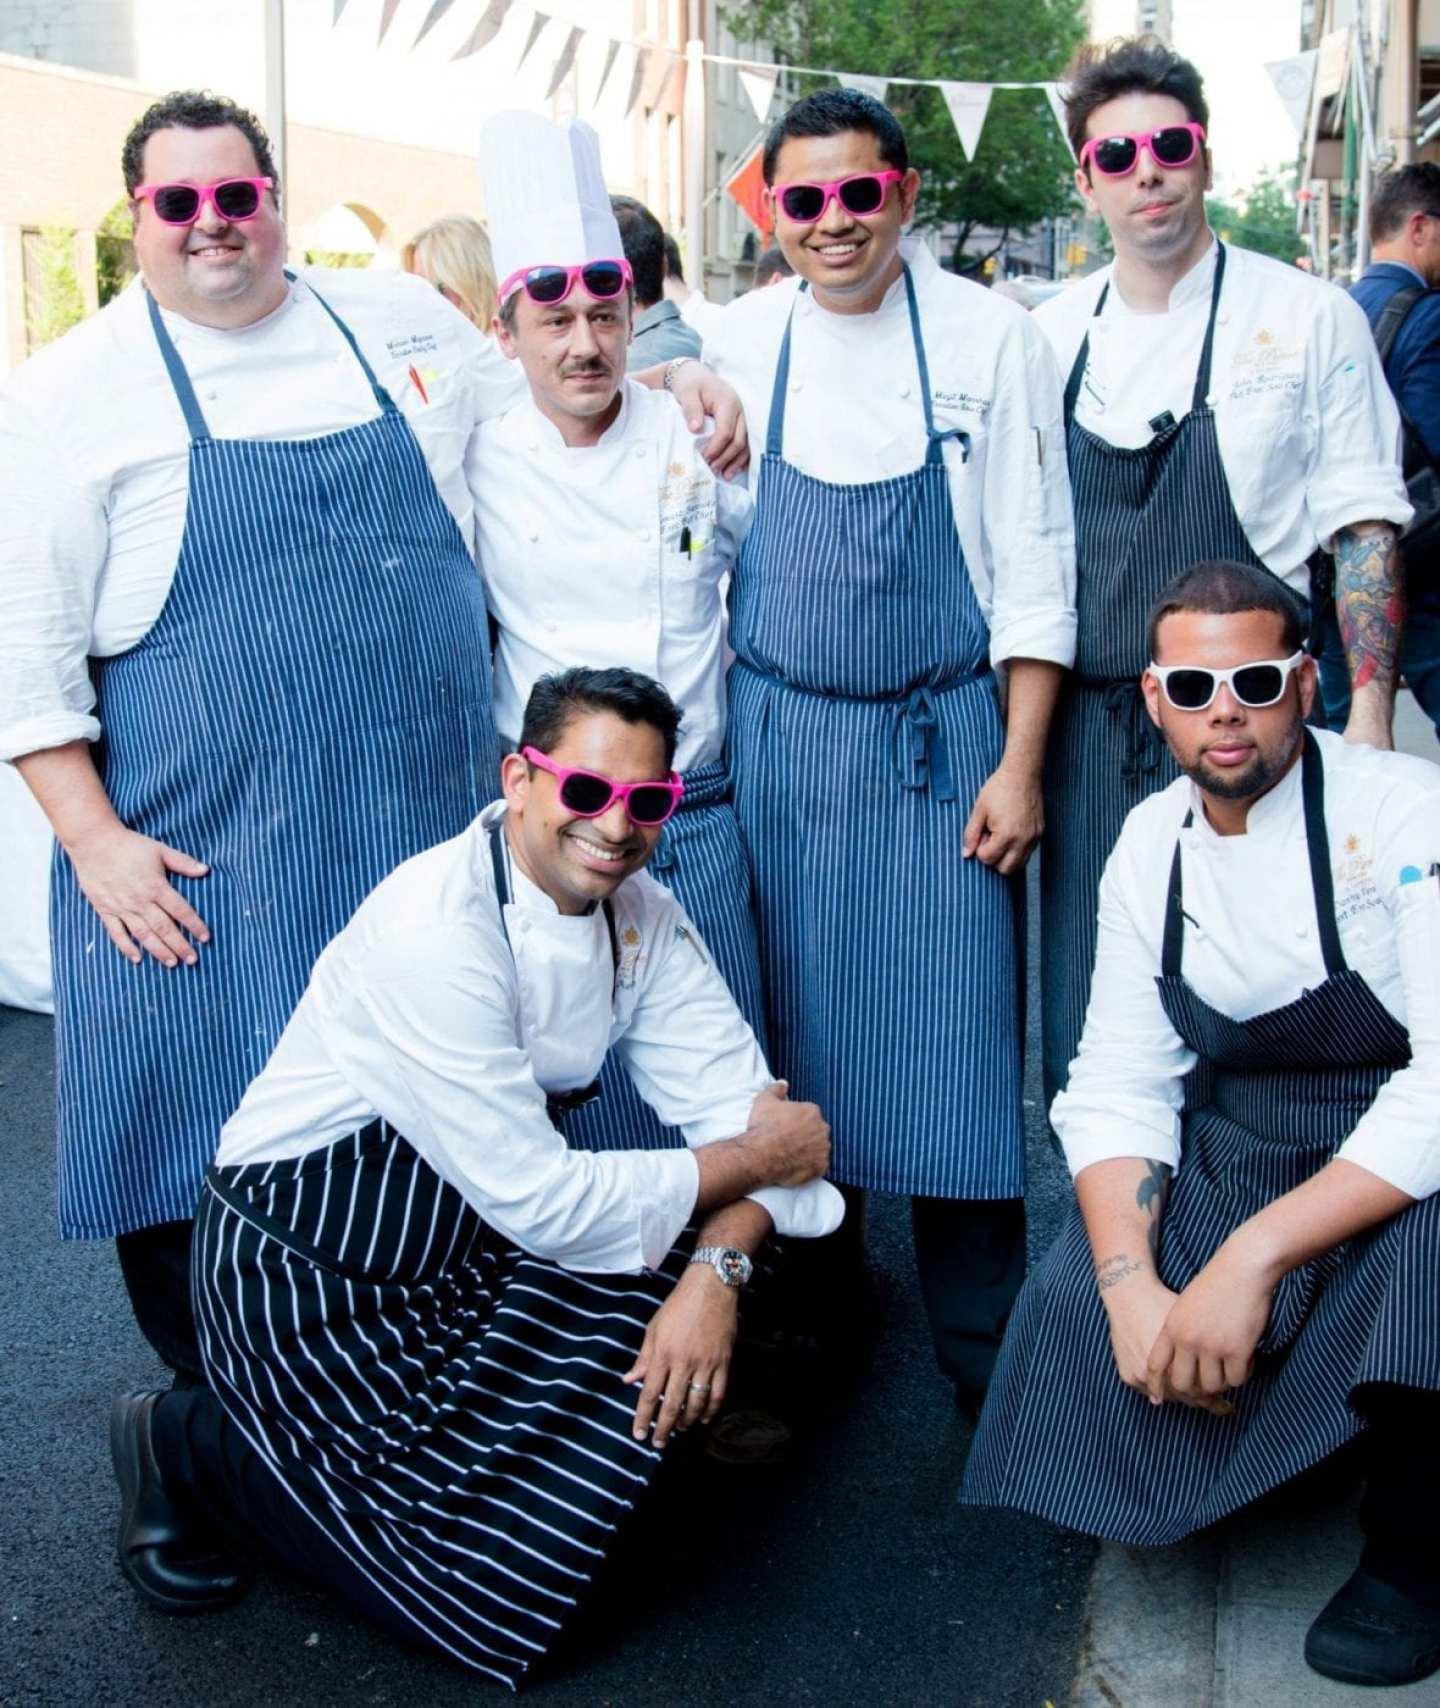 Culinary Team sunglasses